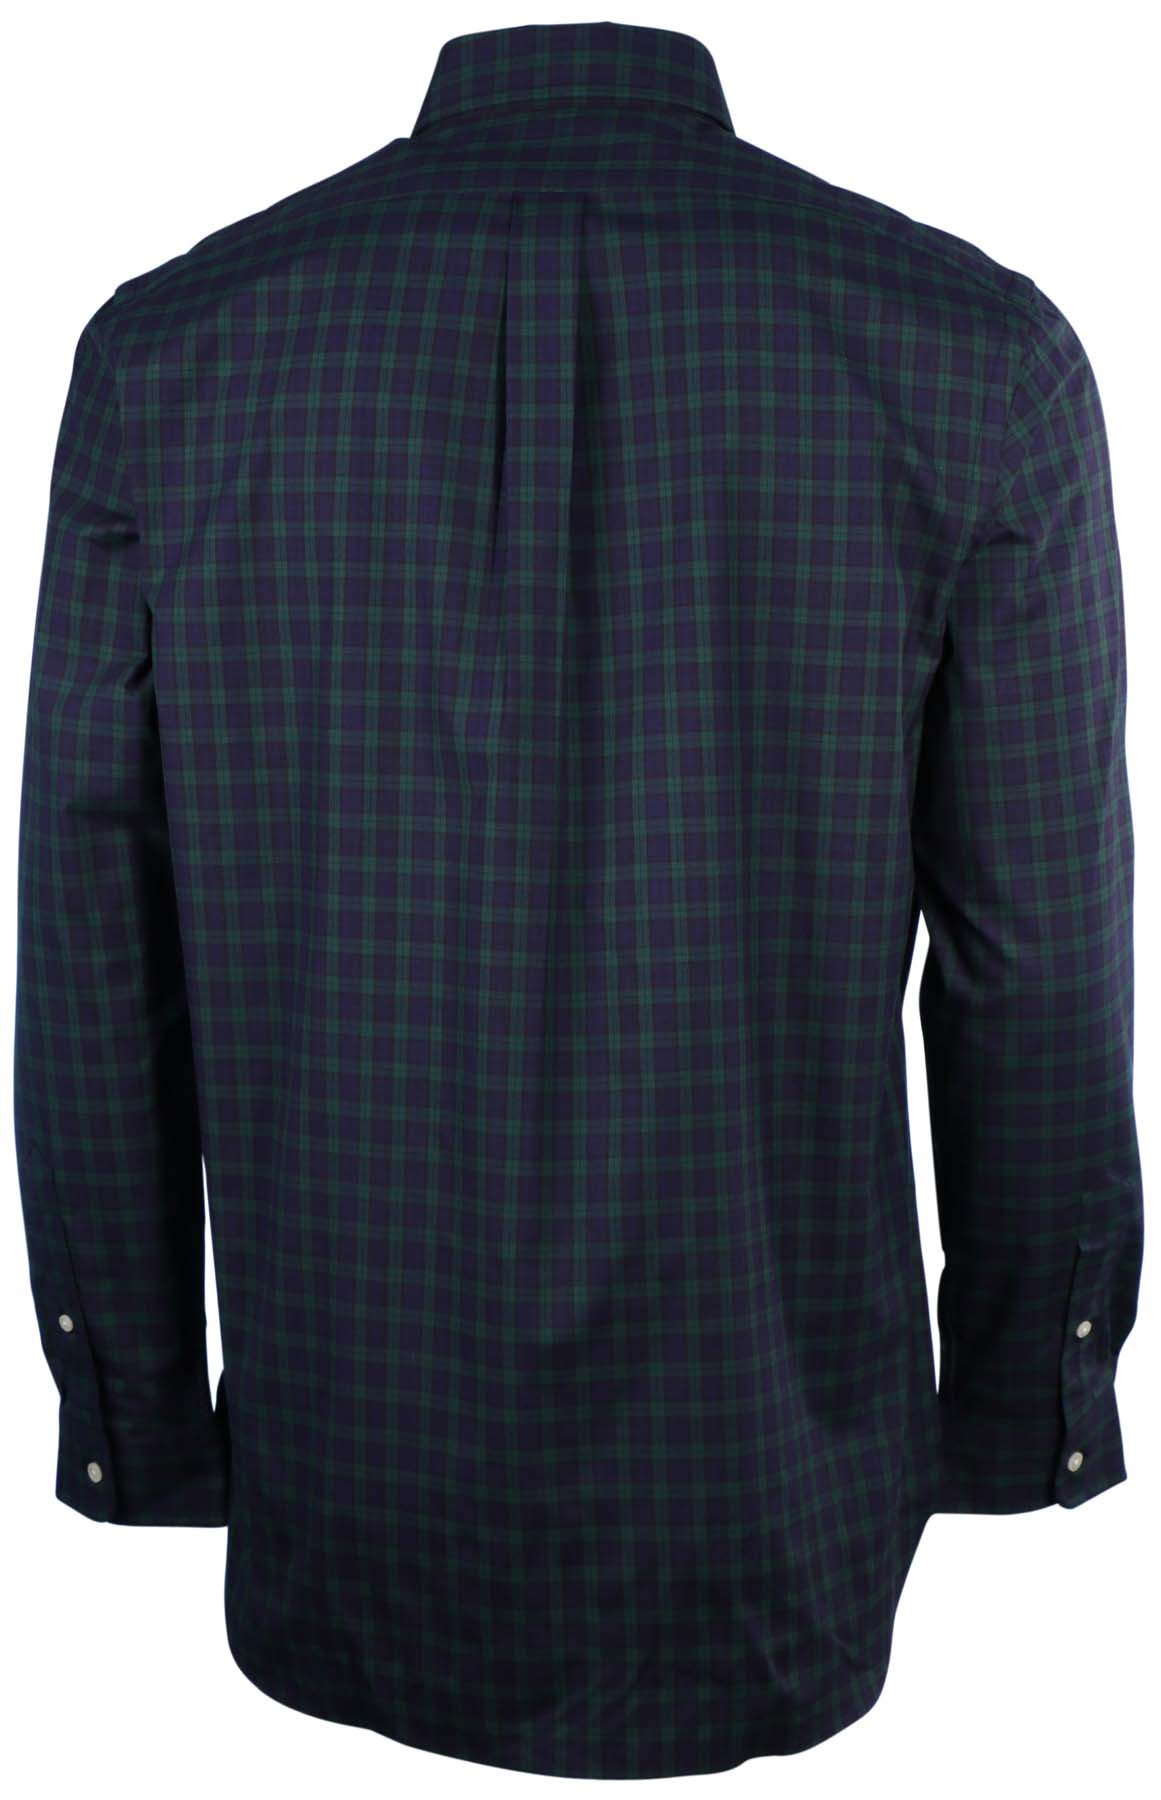 Polo ralph lauren men 39 s plaid tartan button down shirt ebay for Polo ralph lauren casual button down shirts